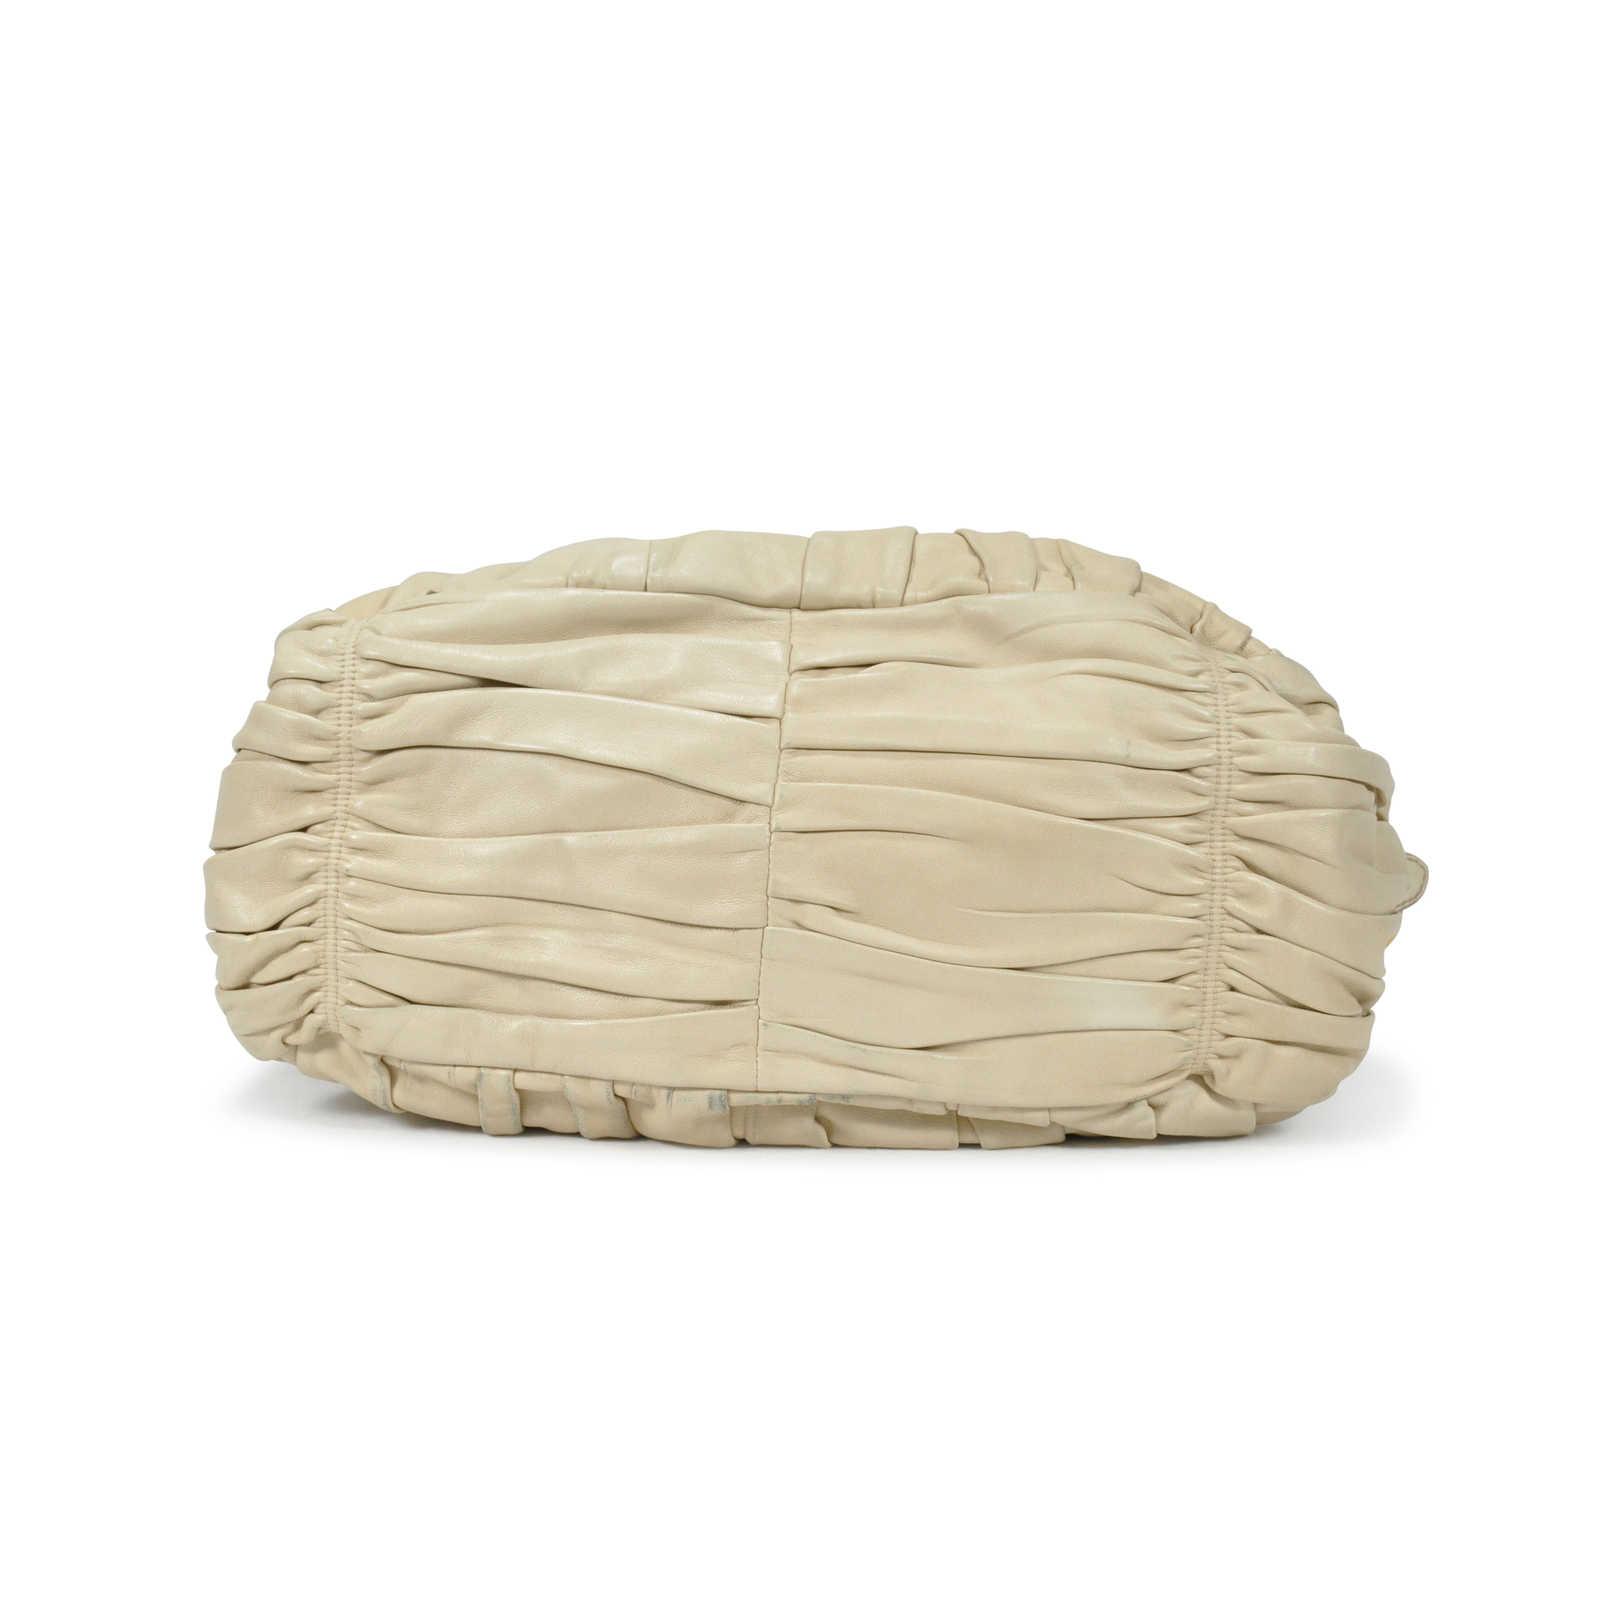 4f8585843b10 ... Authentic Second Hand Prada Nappa Gaufre Bag (PSS-247-00004) -  Thumbnail ...